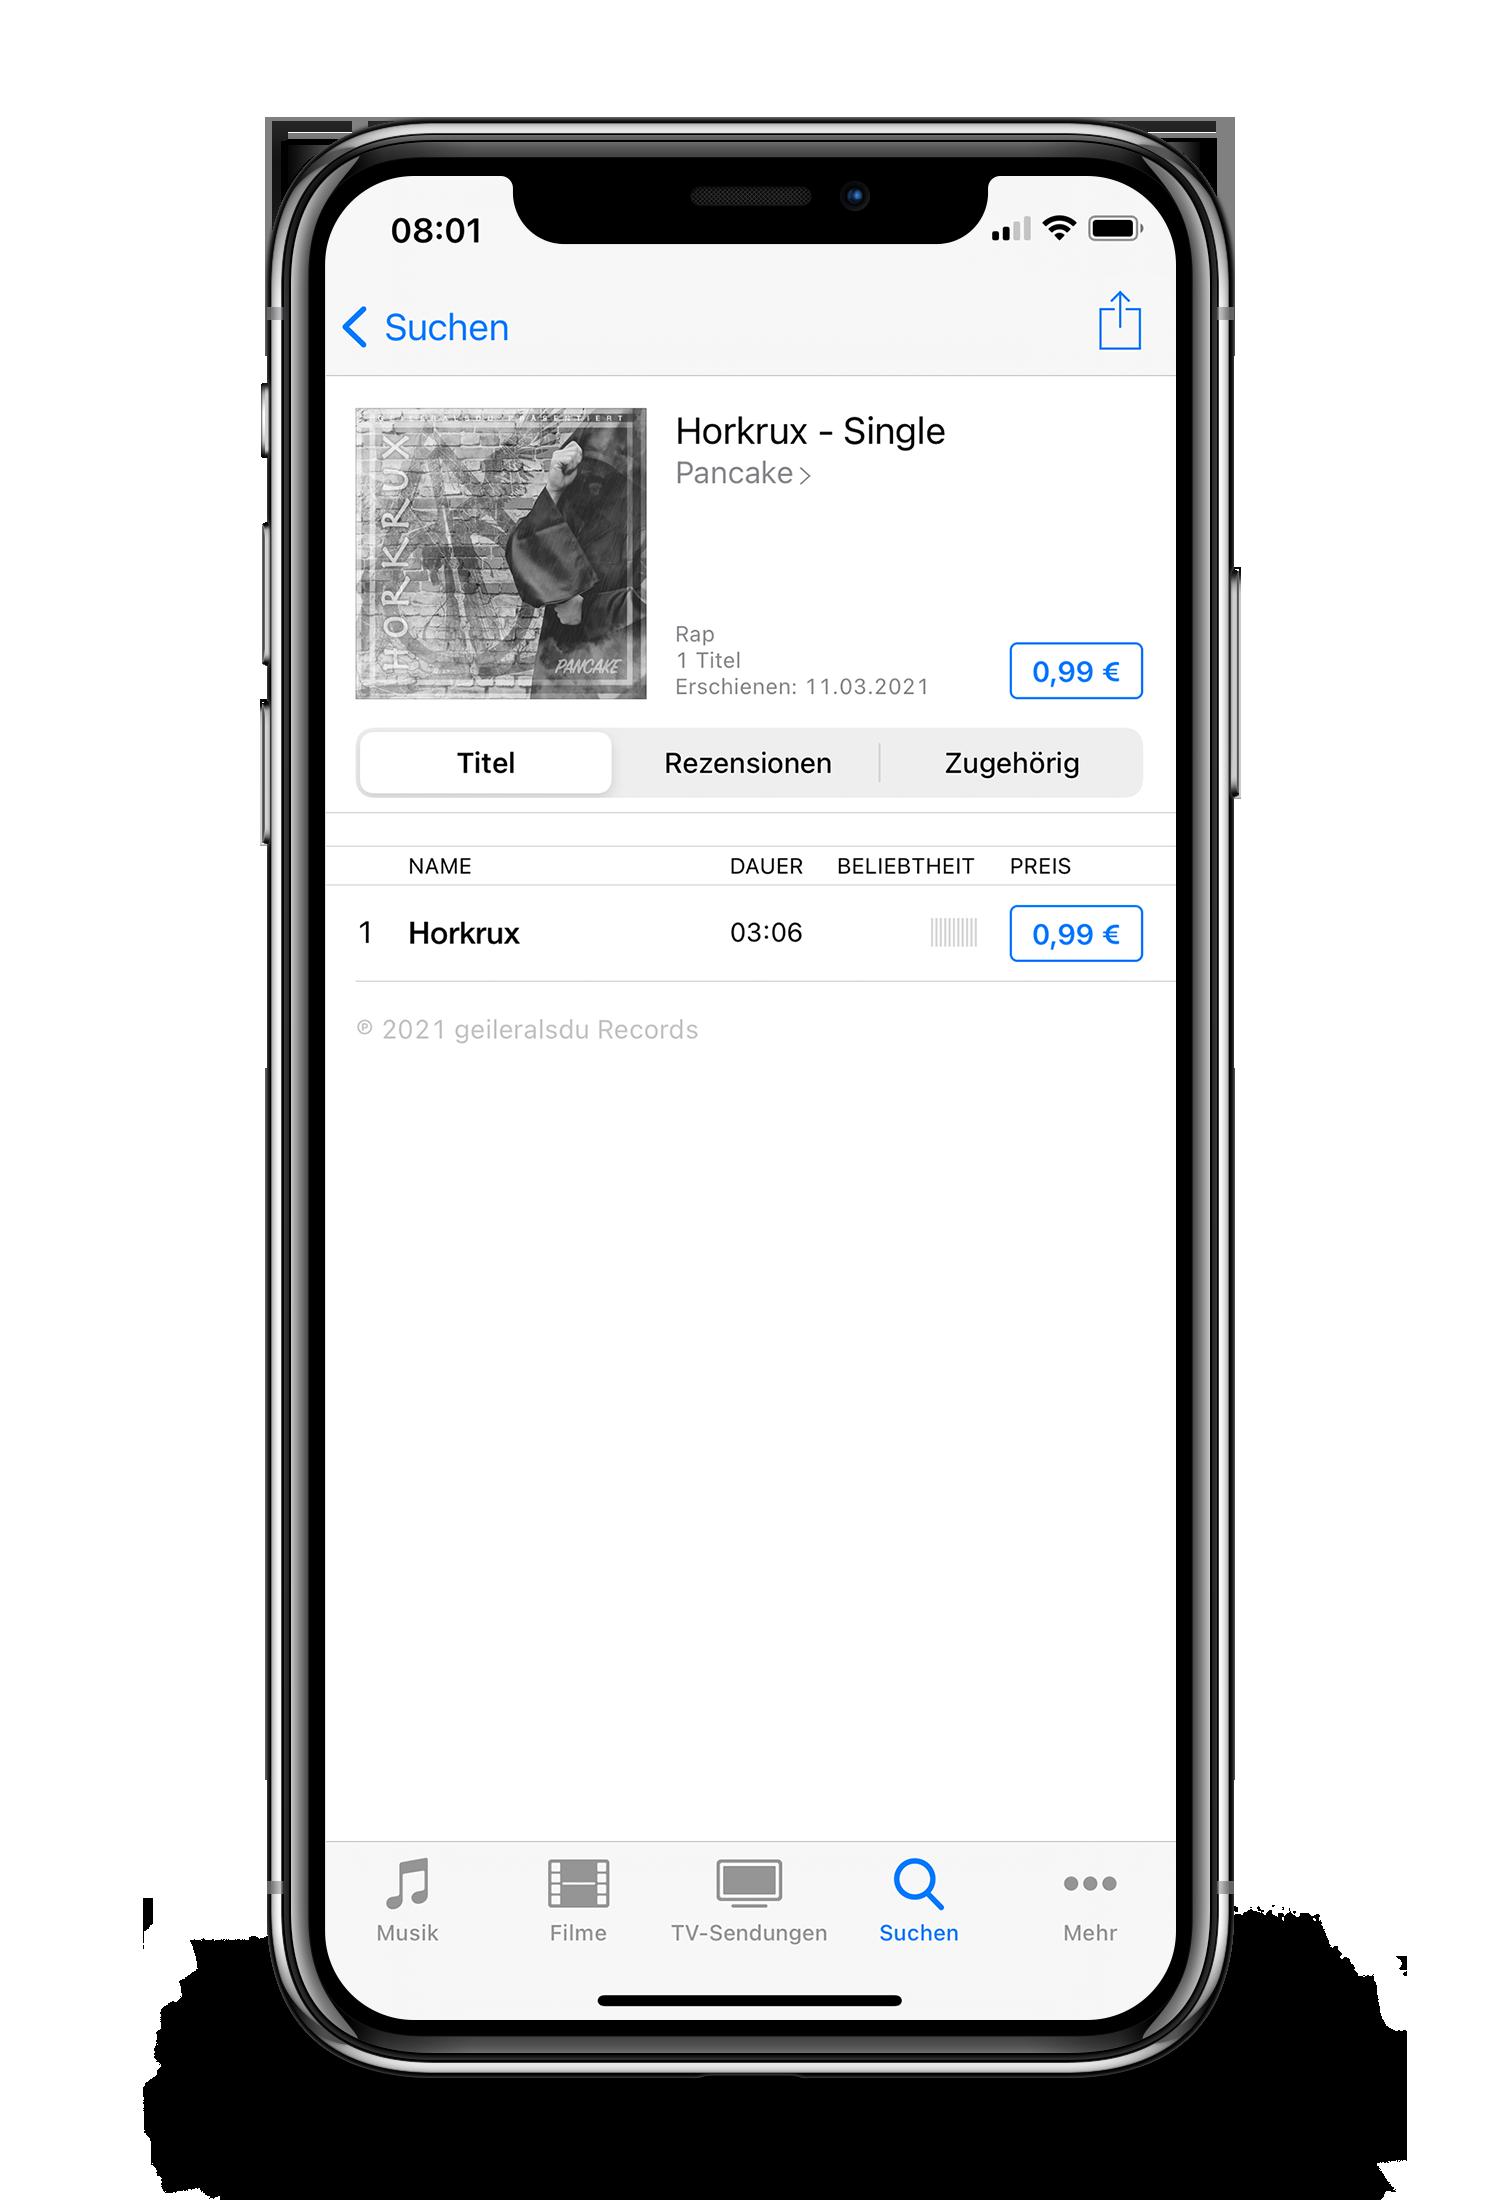 Horkrux iPhone X Mockup